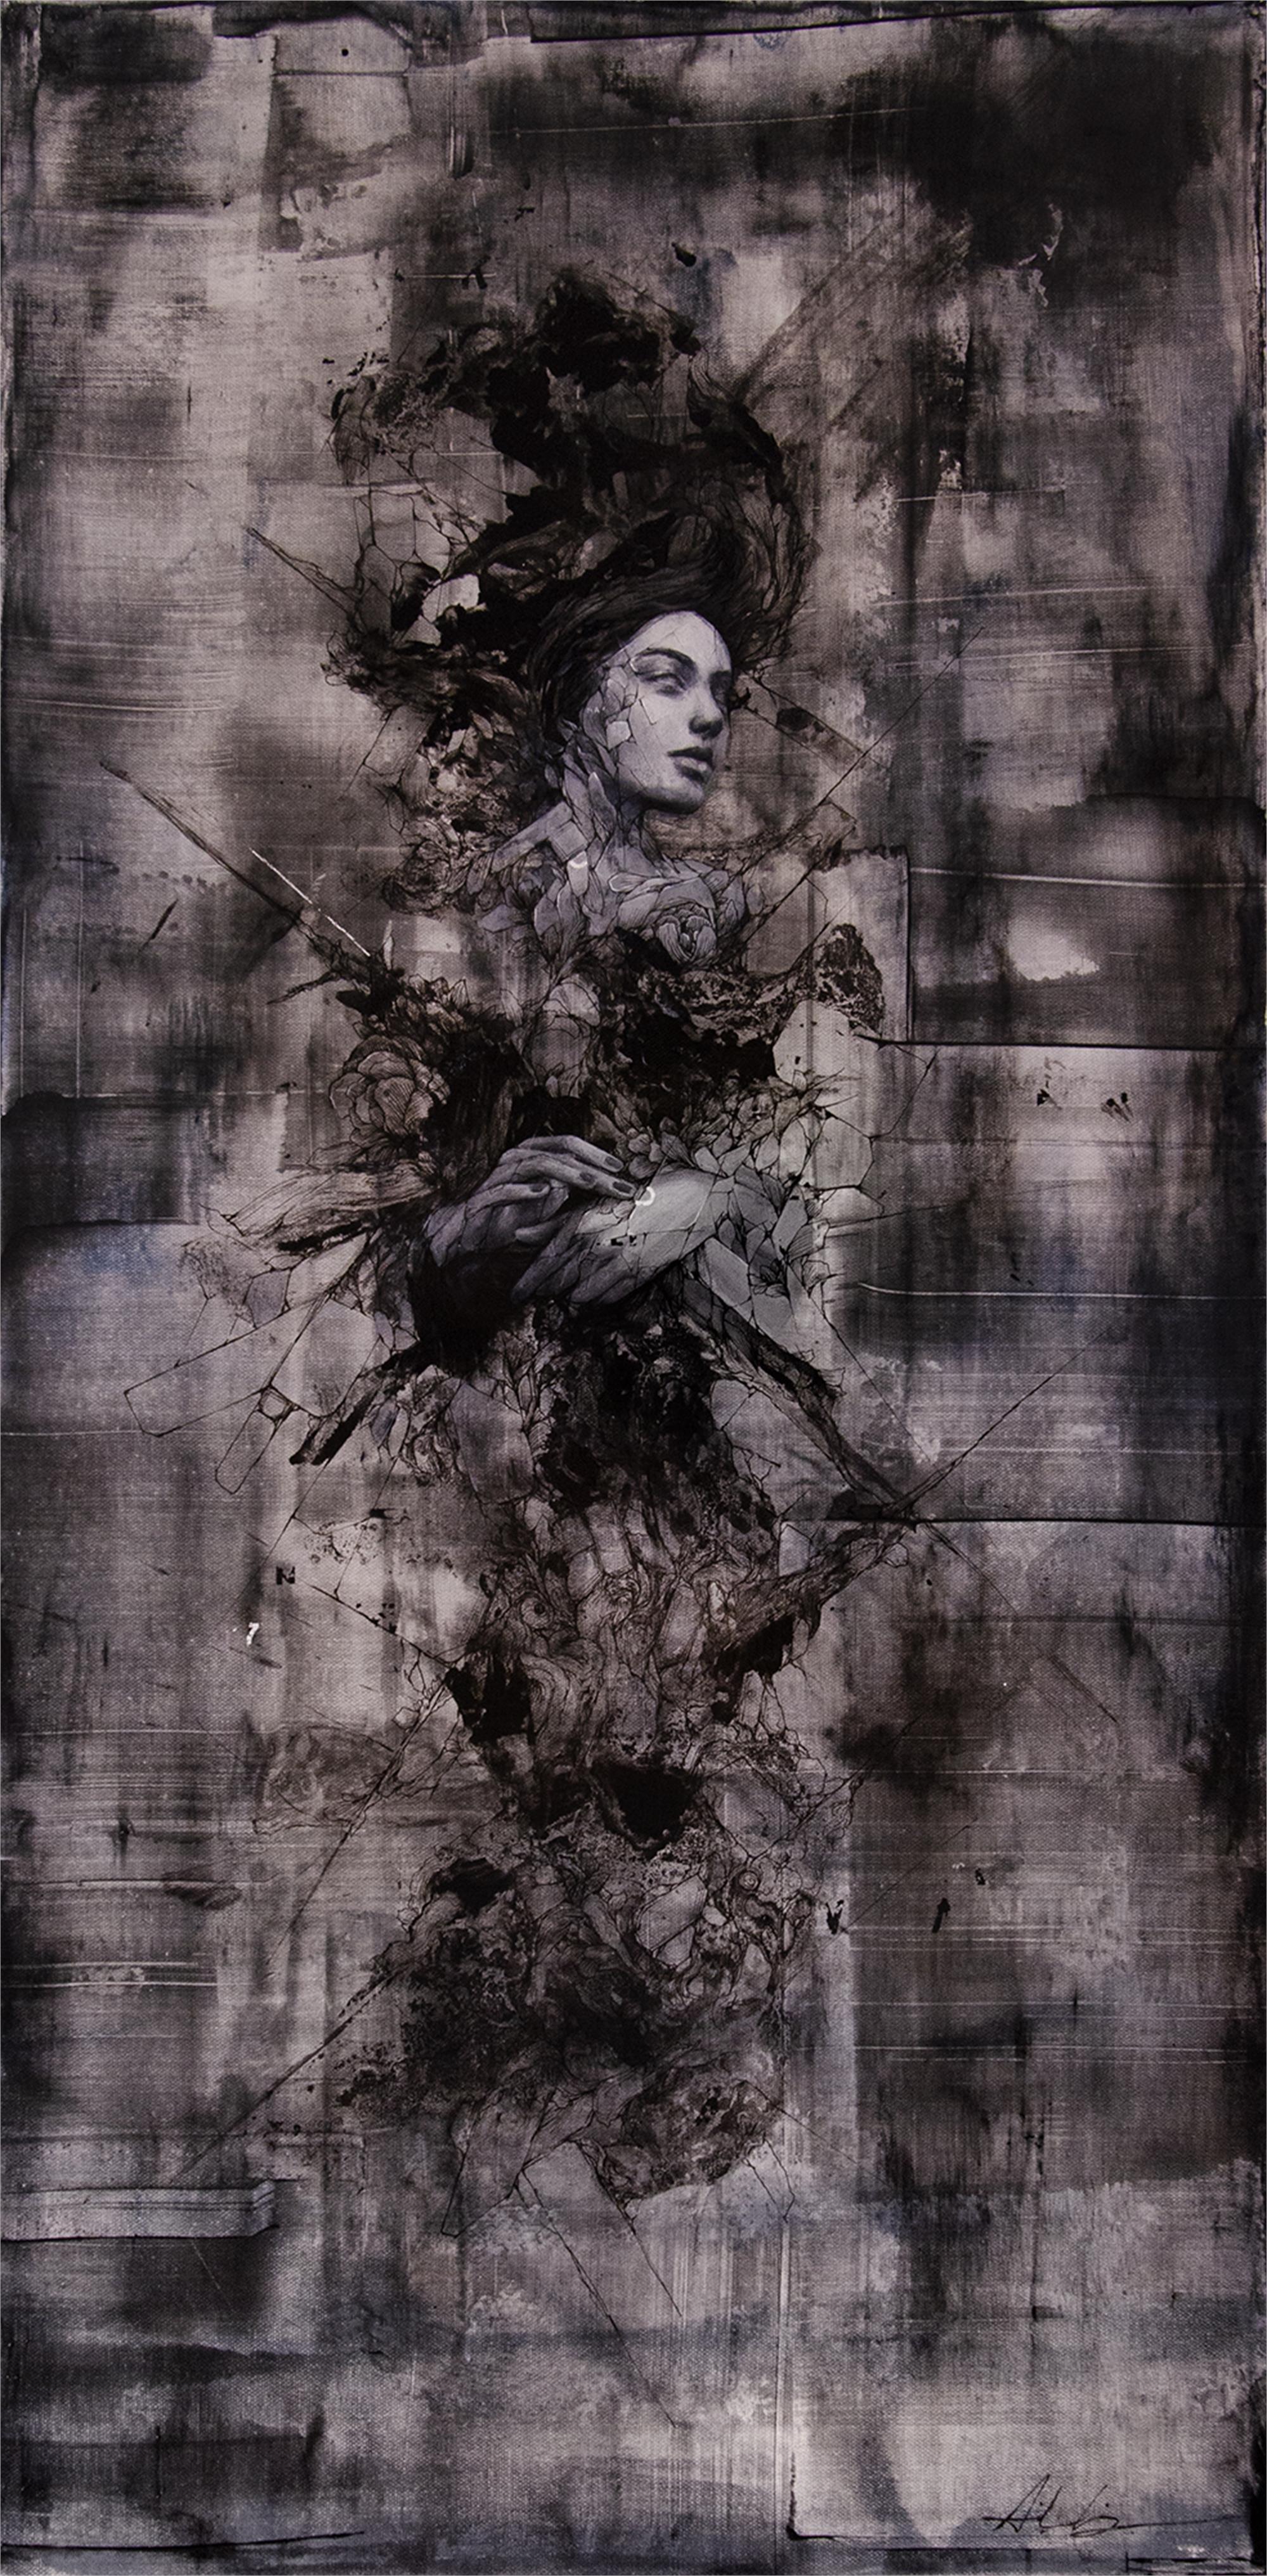 Helix by Aiden Kringen